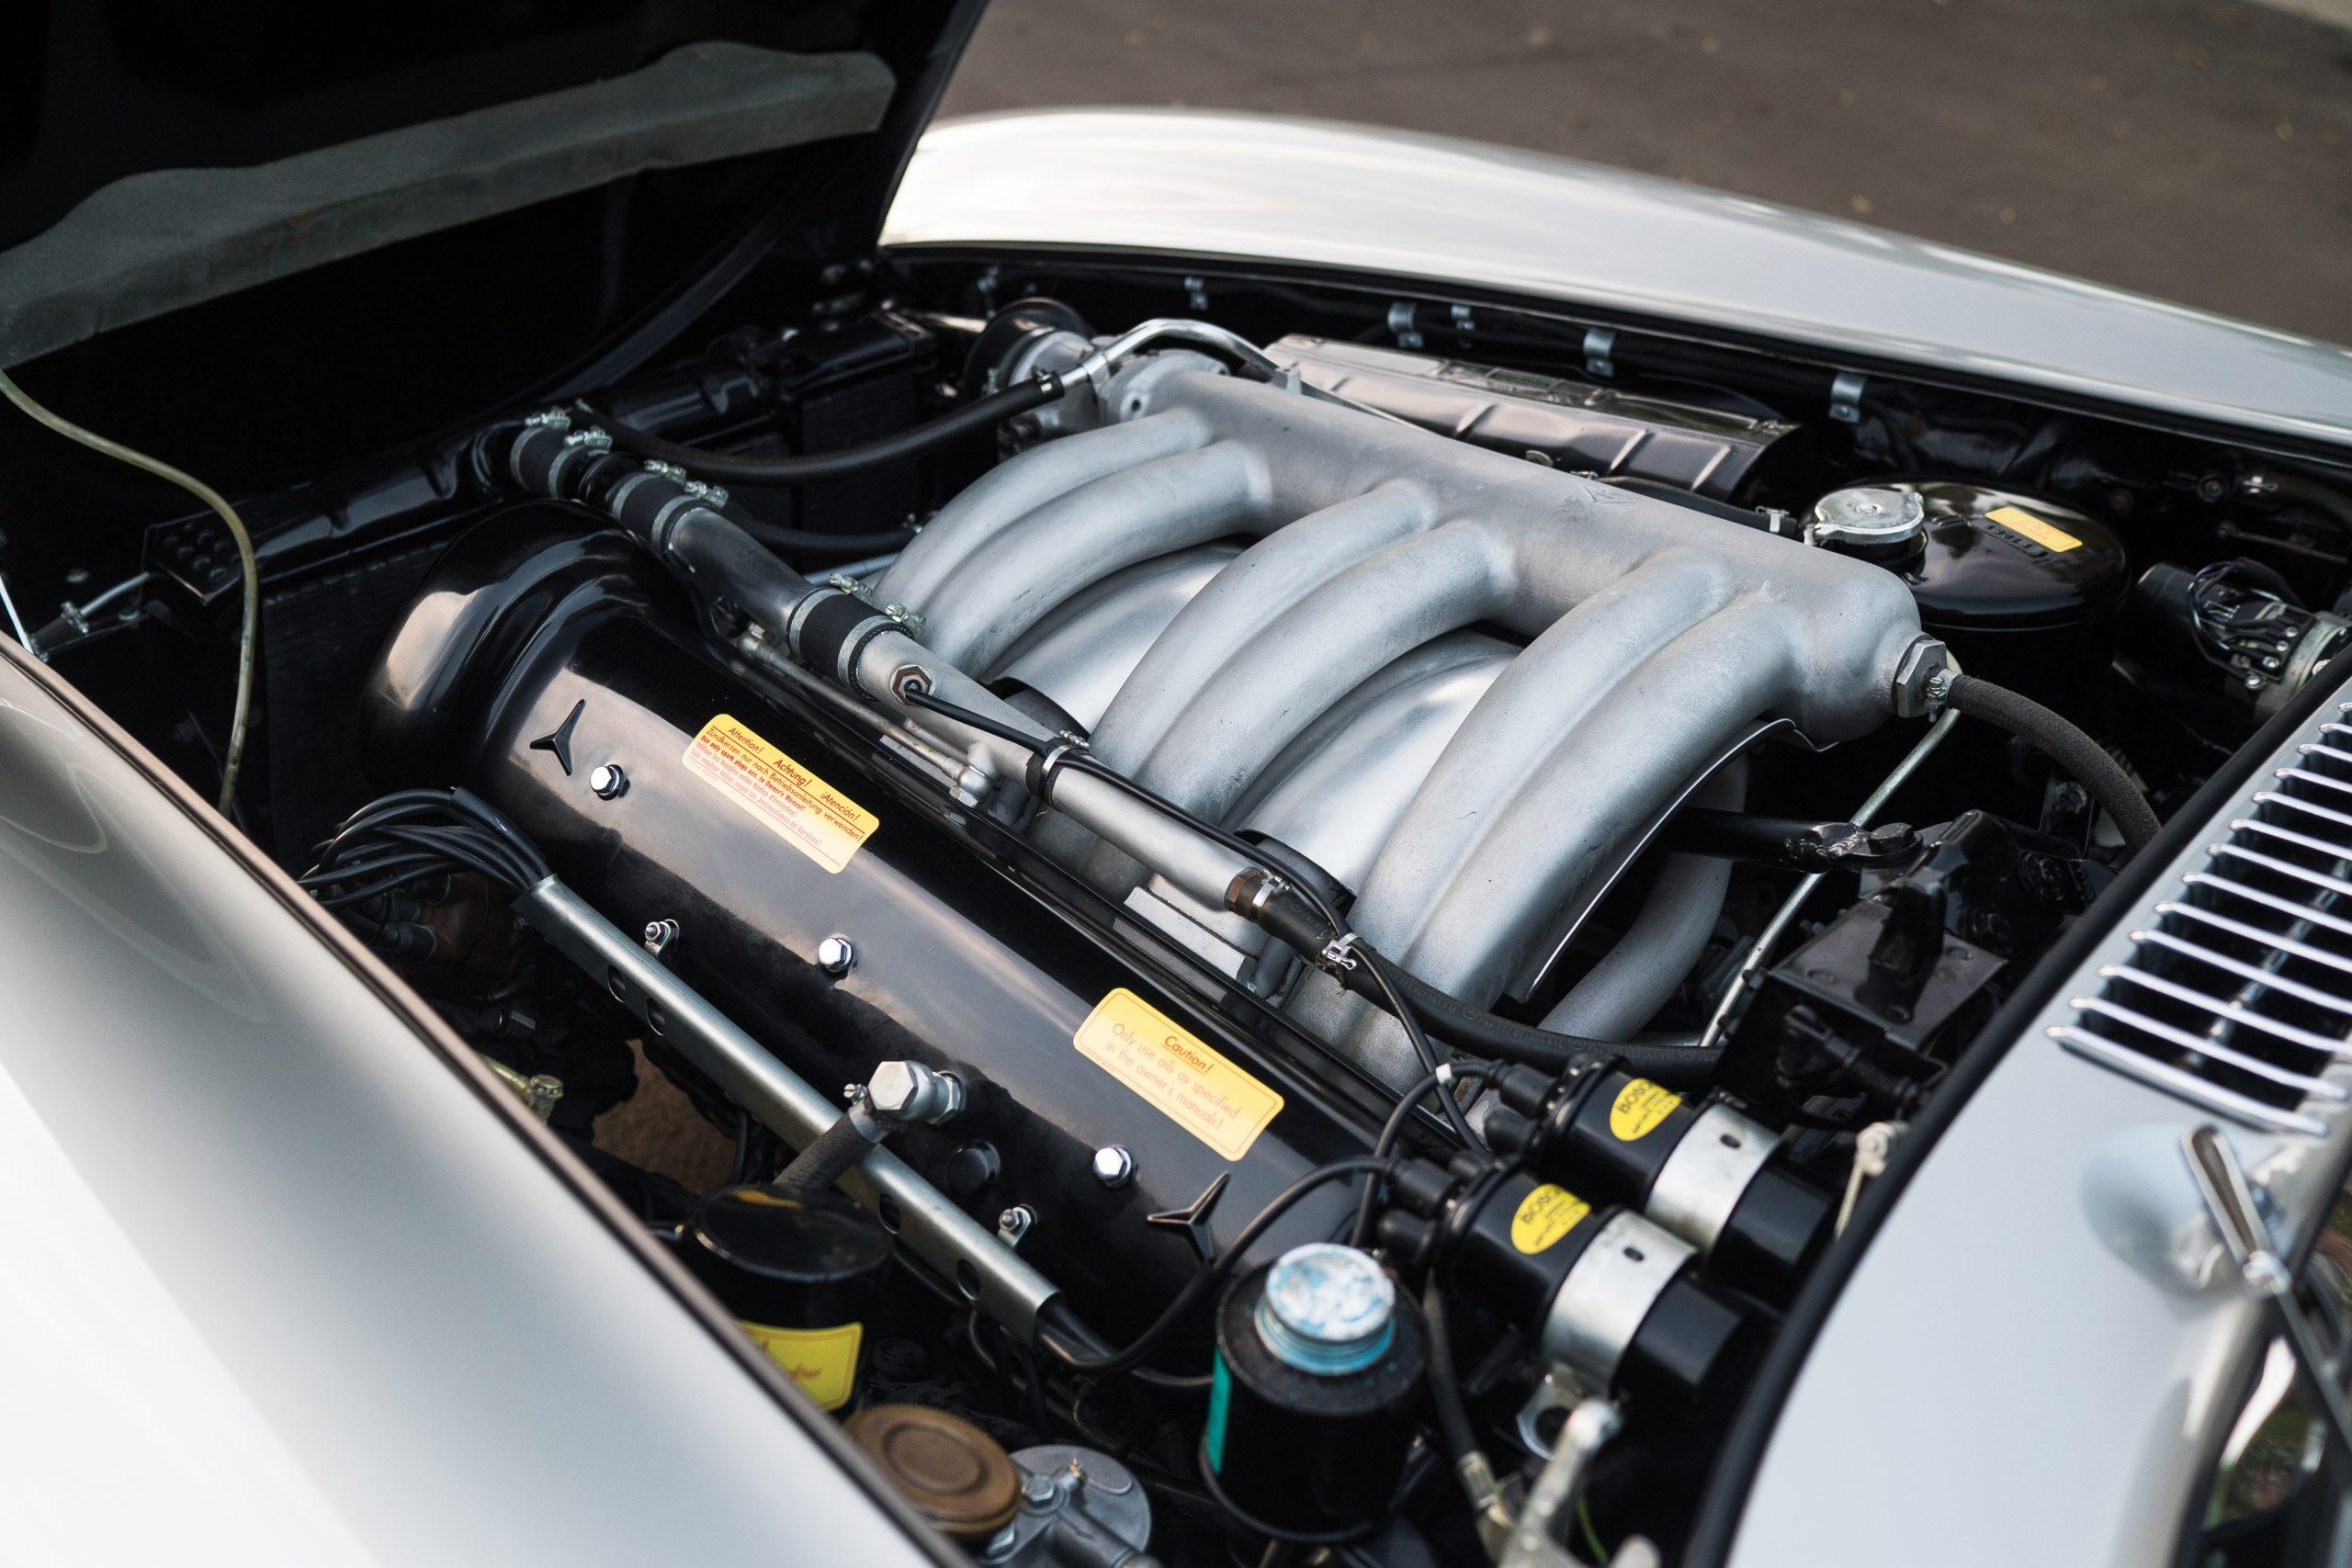 1957-Mercedes-Benz-300-SL-Roadster engine